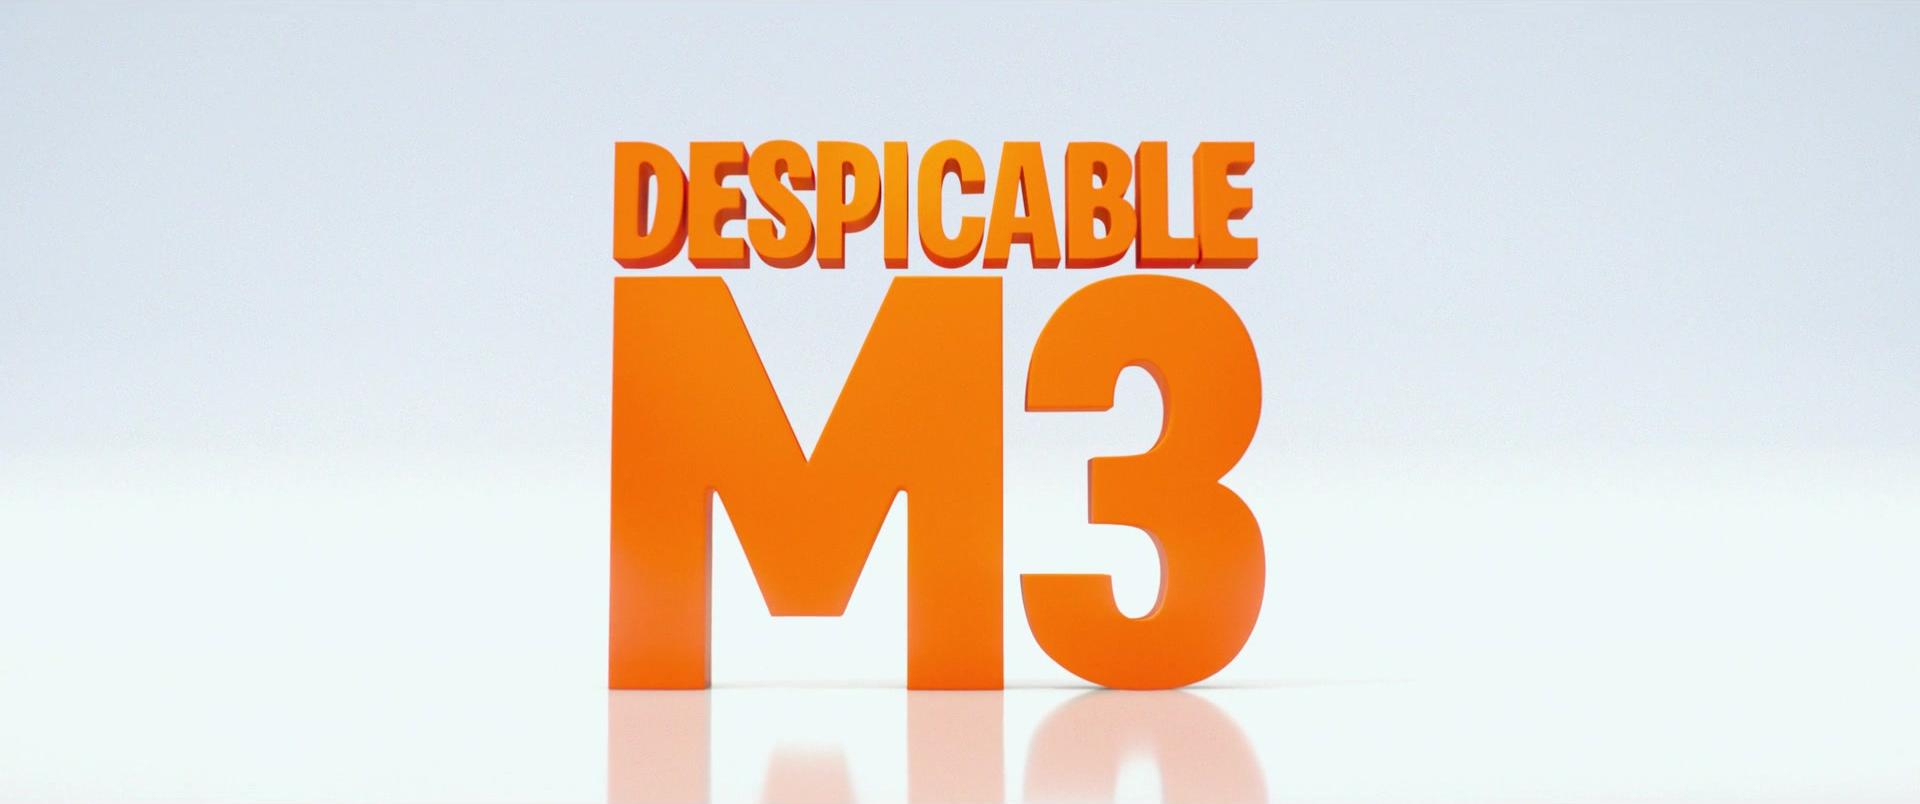 Despicable Me 3.